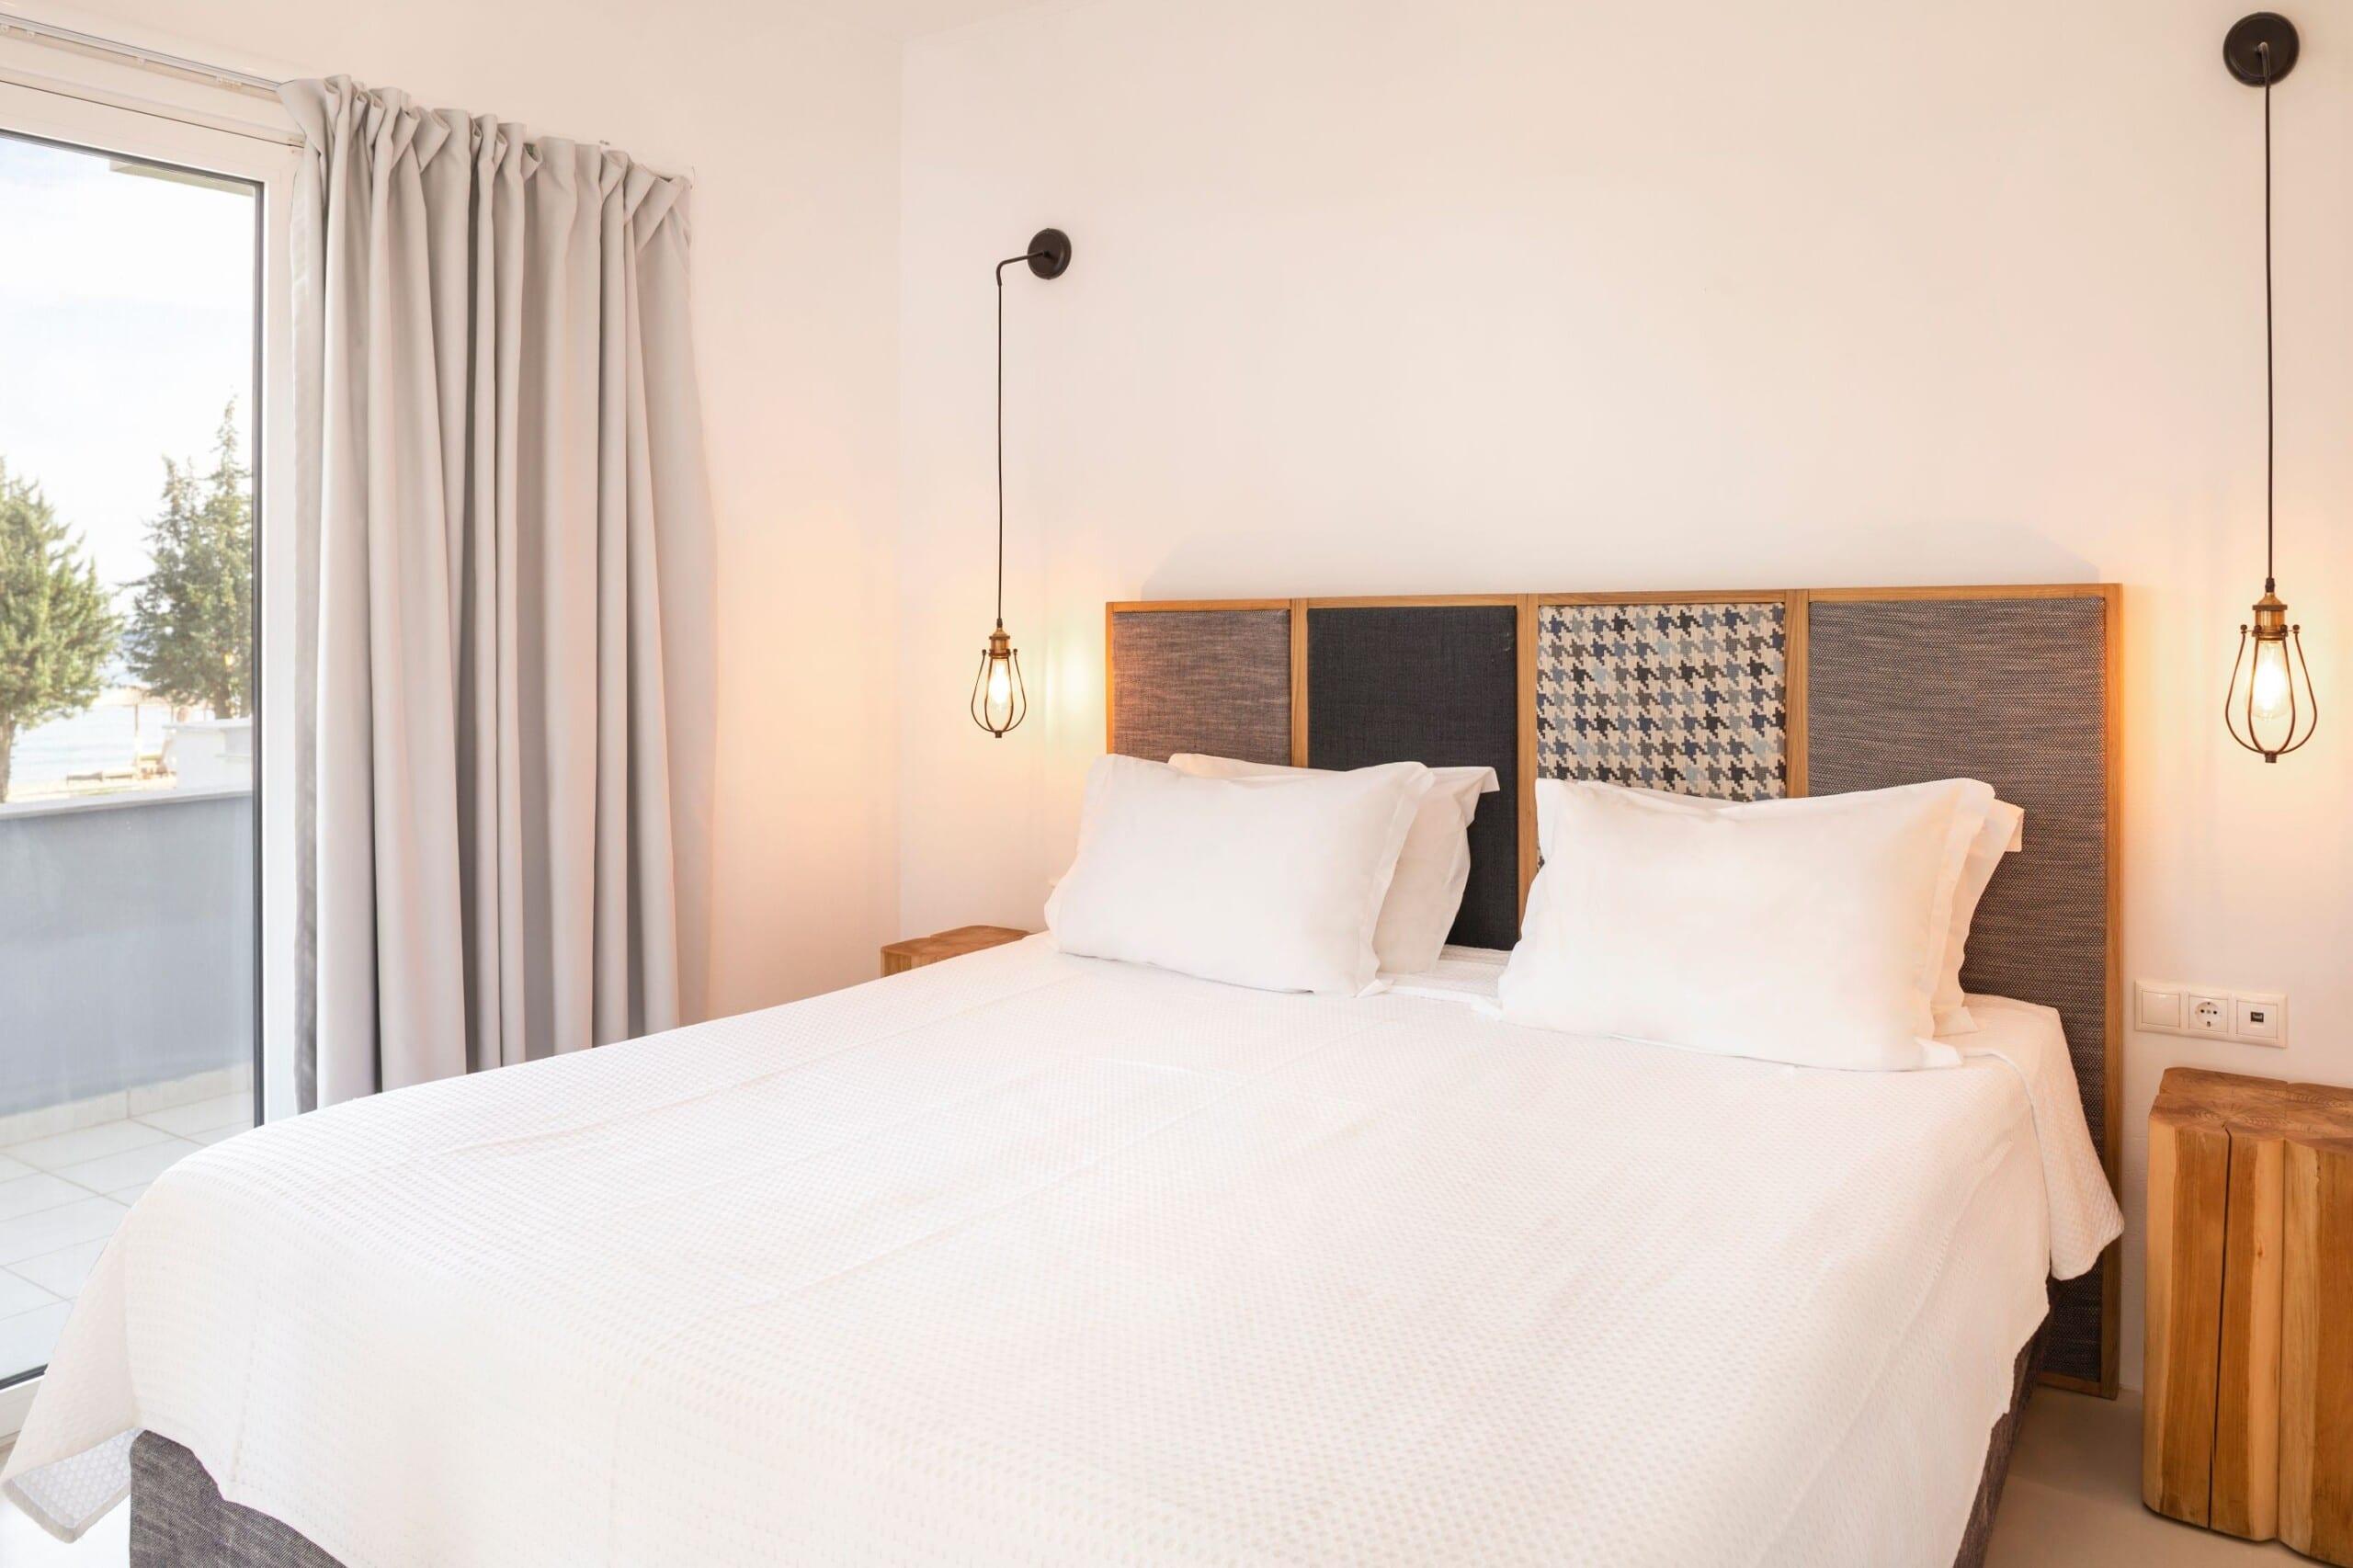 Bedroom of Doryssa Coast's seaview apartments in Samos